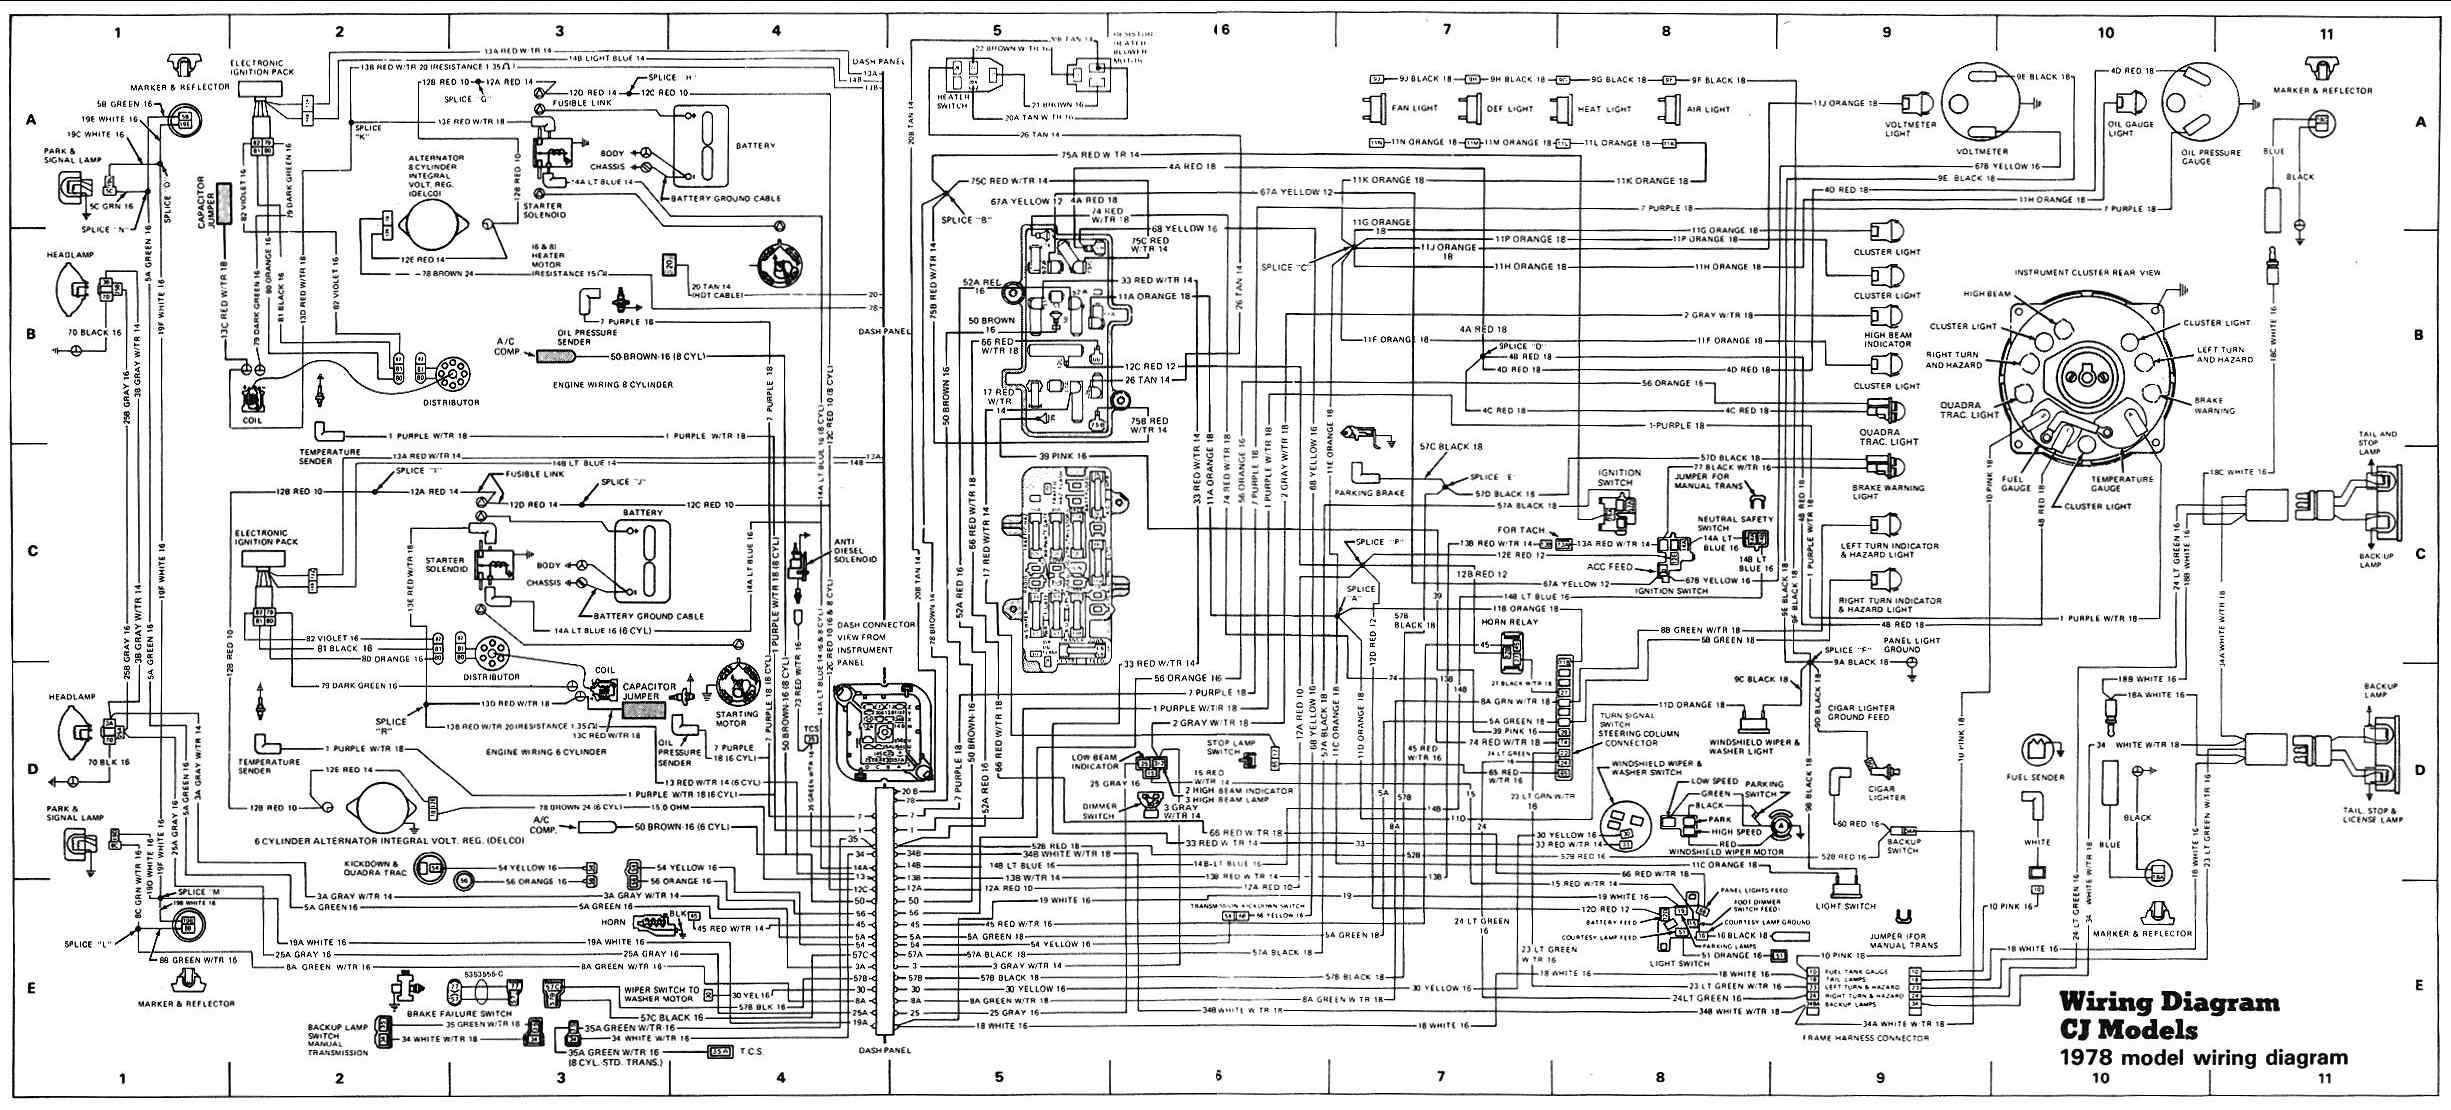 medium resolution of cj8 wiring harness diagram simple wiring post fuse box diagram fuse panel diagram cj8